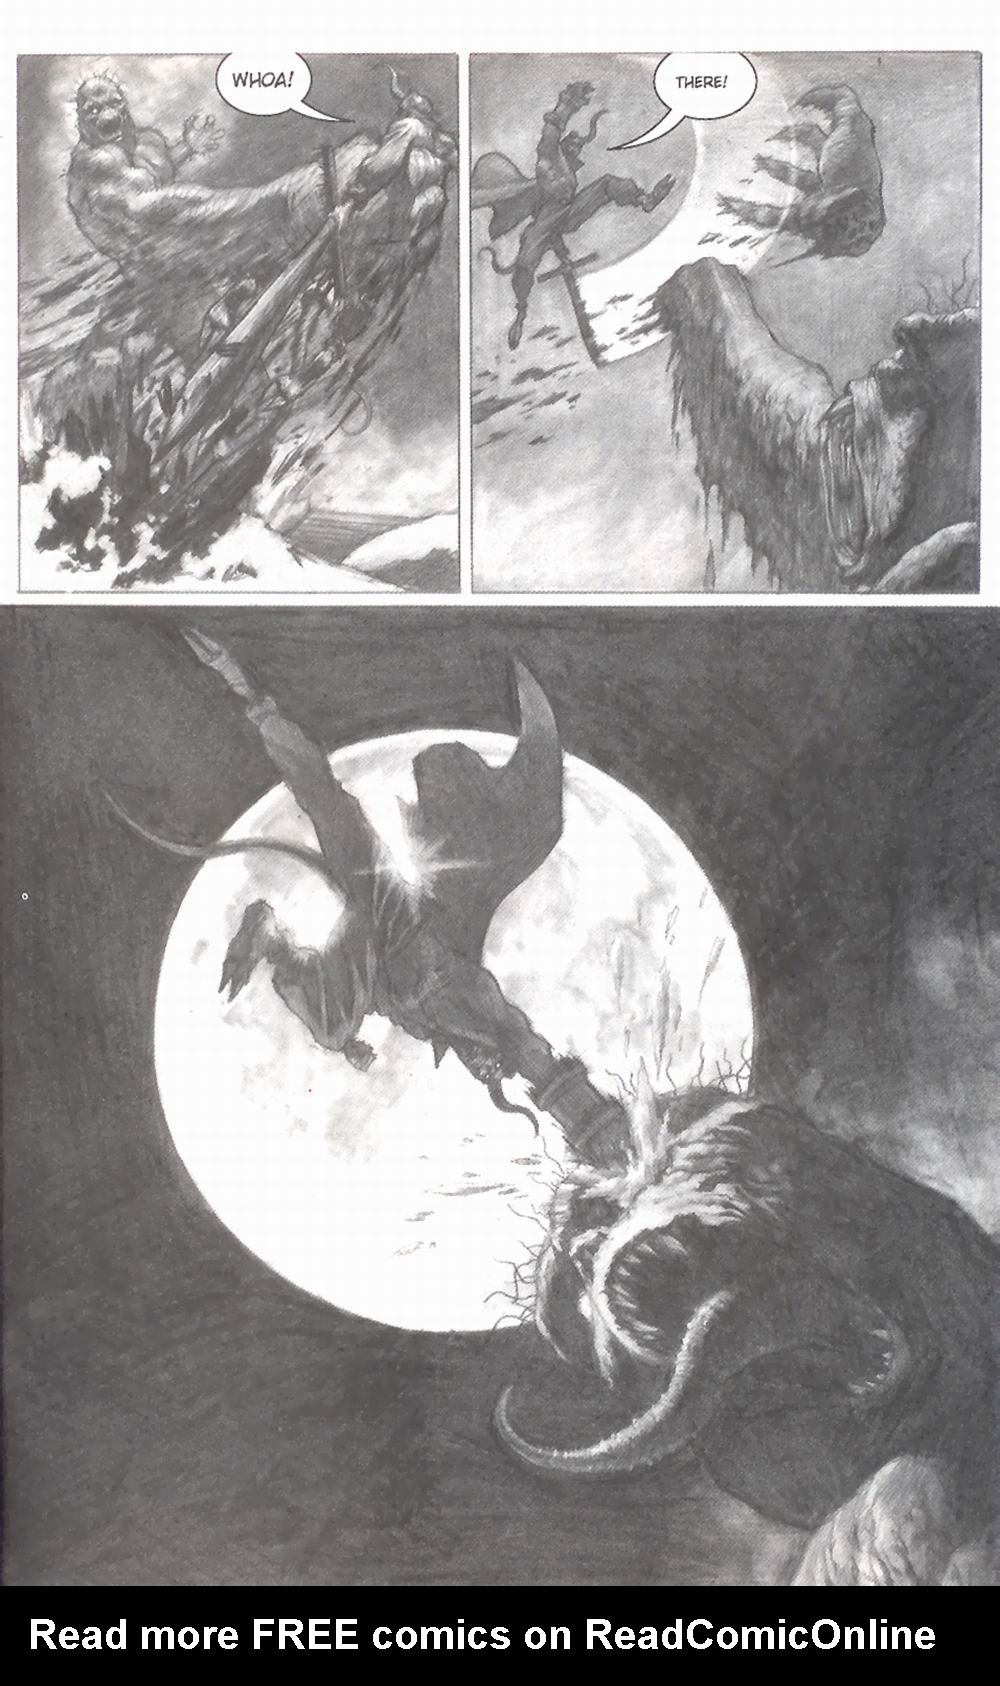 Read online Hellboy: Weird Tales comic -  Issue #2 - 17